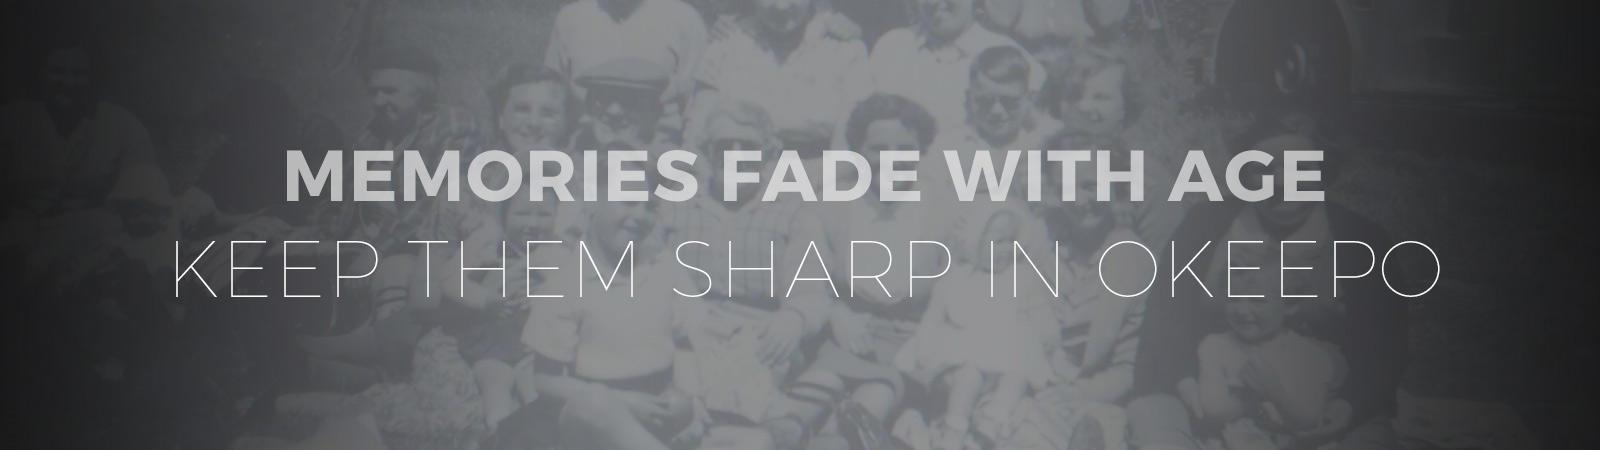 Memories fade - keep them sharp with Okeepo